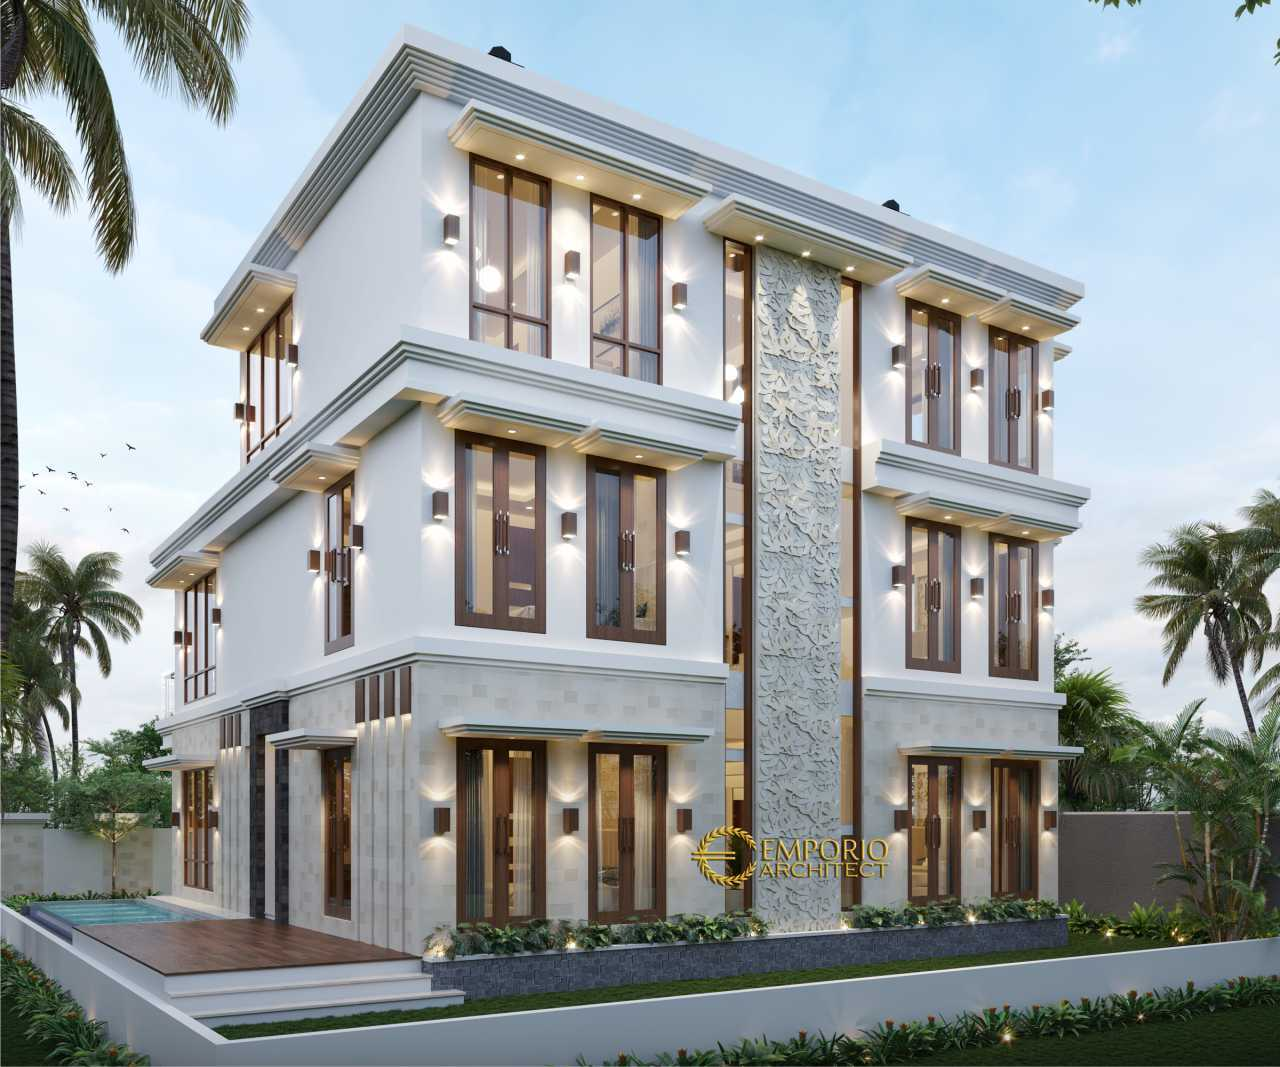 Emporio Architect Jasa Arsitek India Desain Rumah Villa Bali 2 Lantai 724 @ India India India Emporio-Architect-Jasa-Arsitek-India-Desain-Rumah-Villa-Bali-2-Lantai-724-India  93941